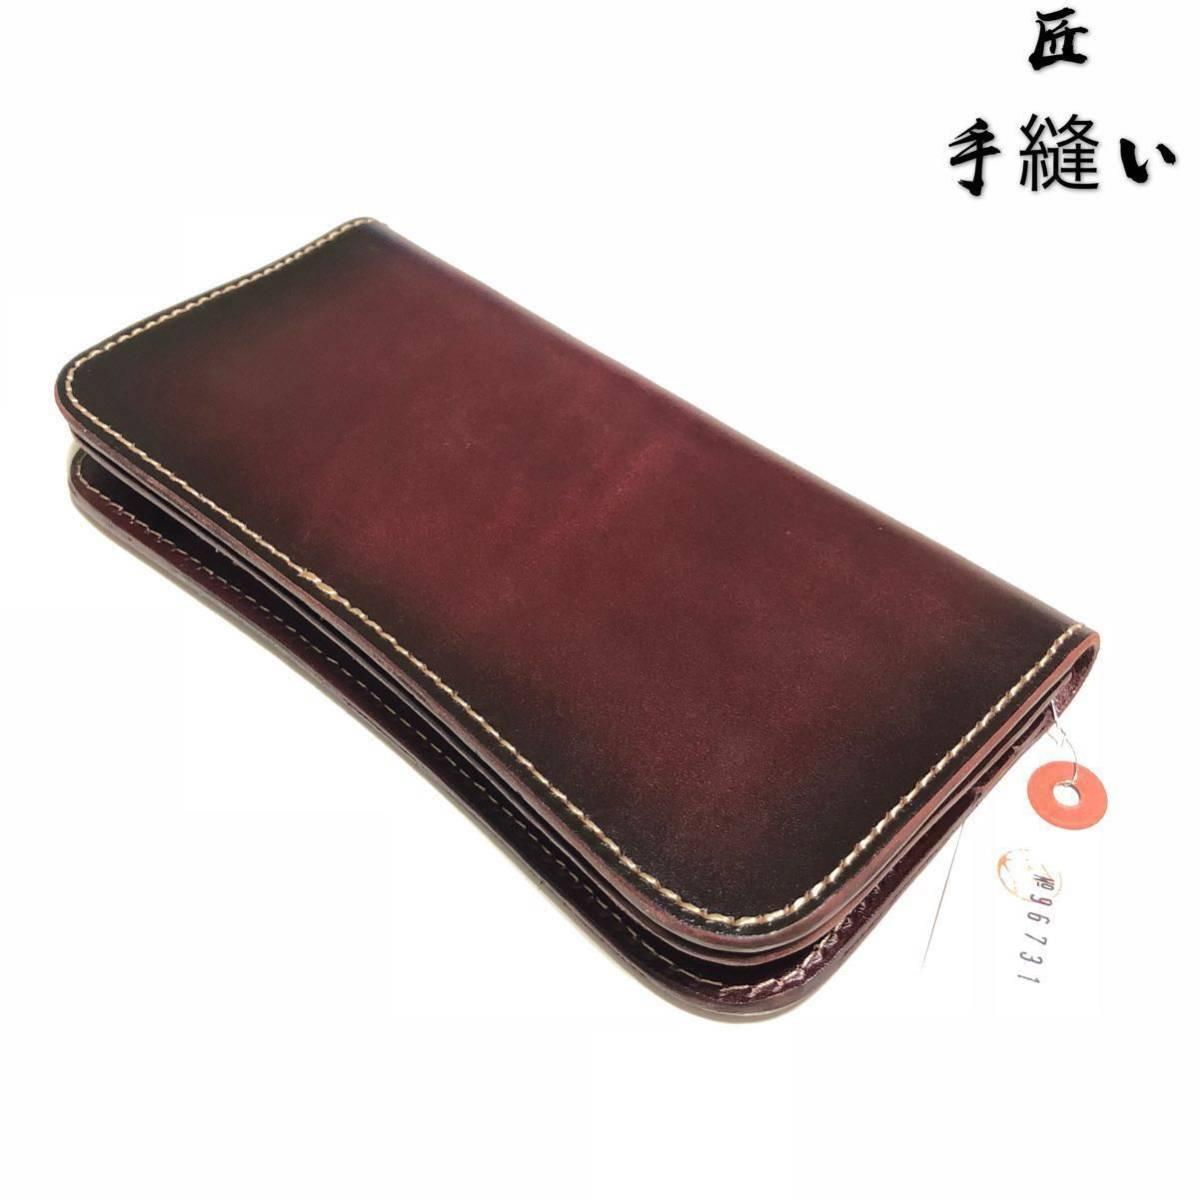 d885693513cf メンズ二つ折り財布の値段と価格推移は?|3,280件の売買情報を集計した ...